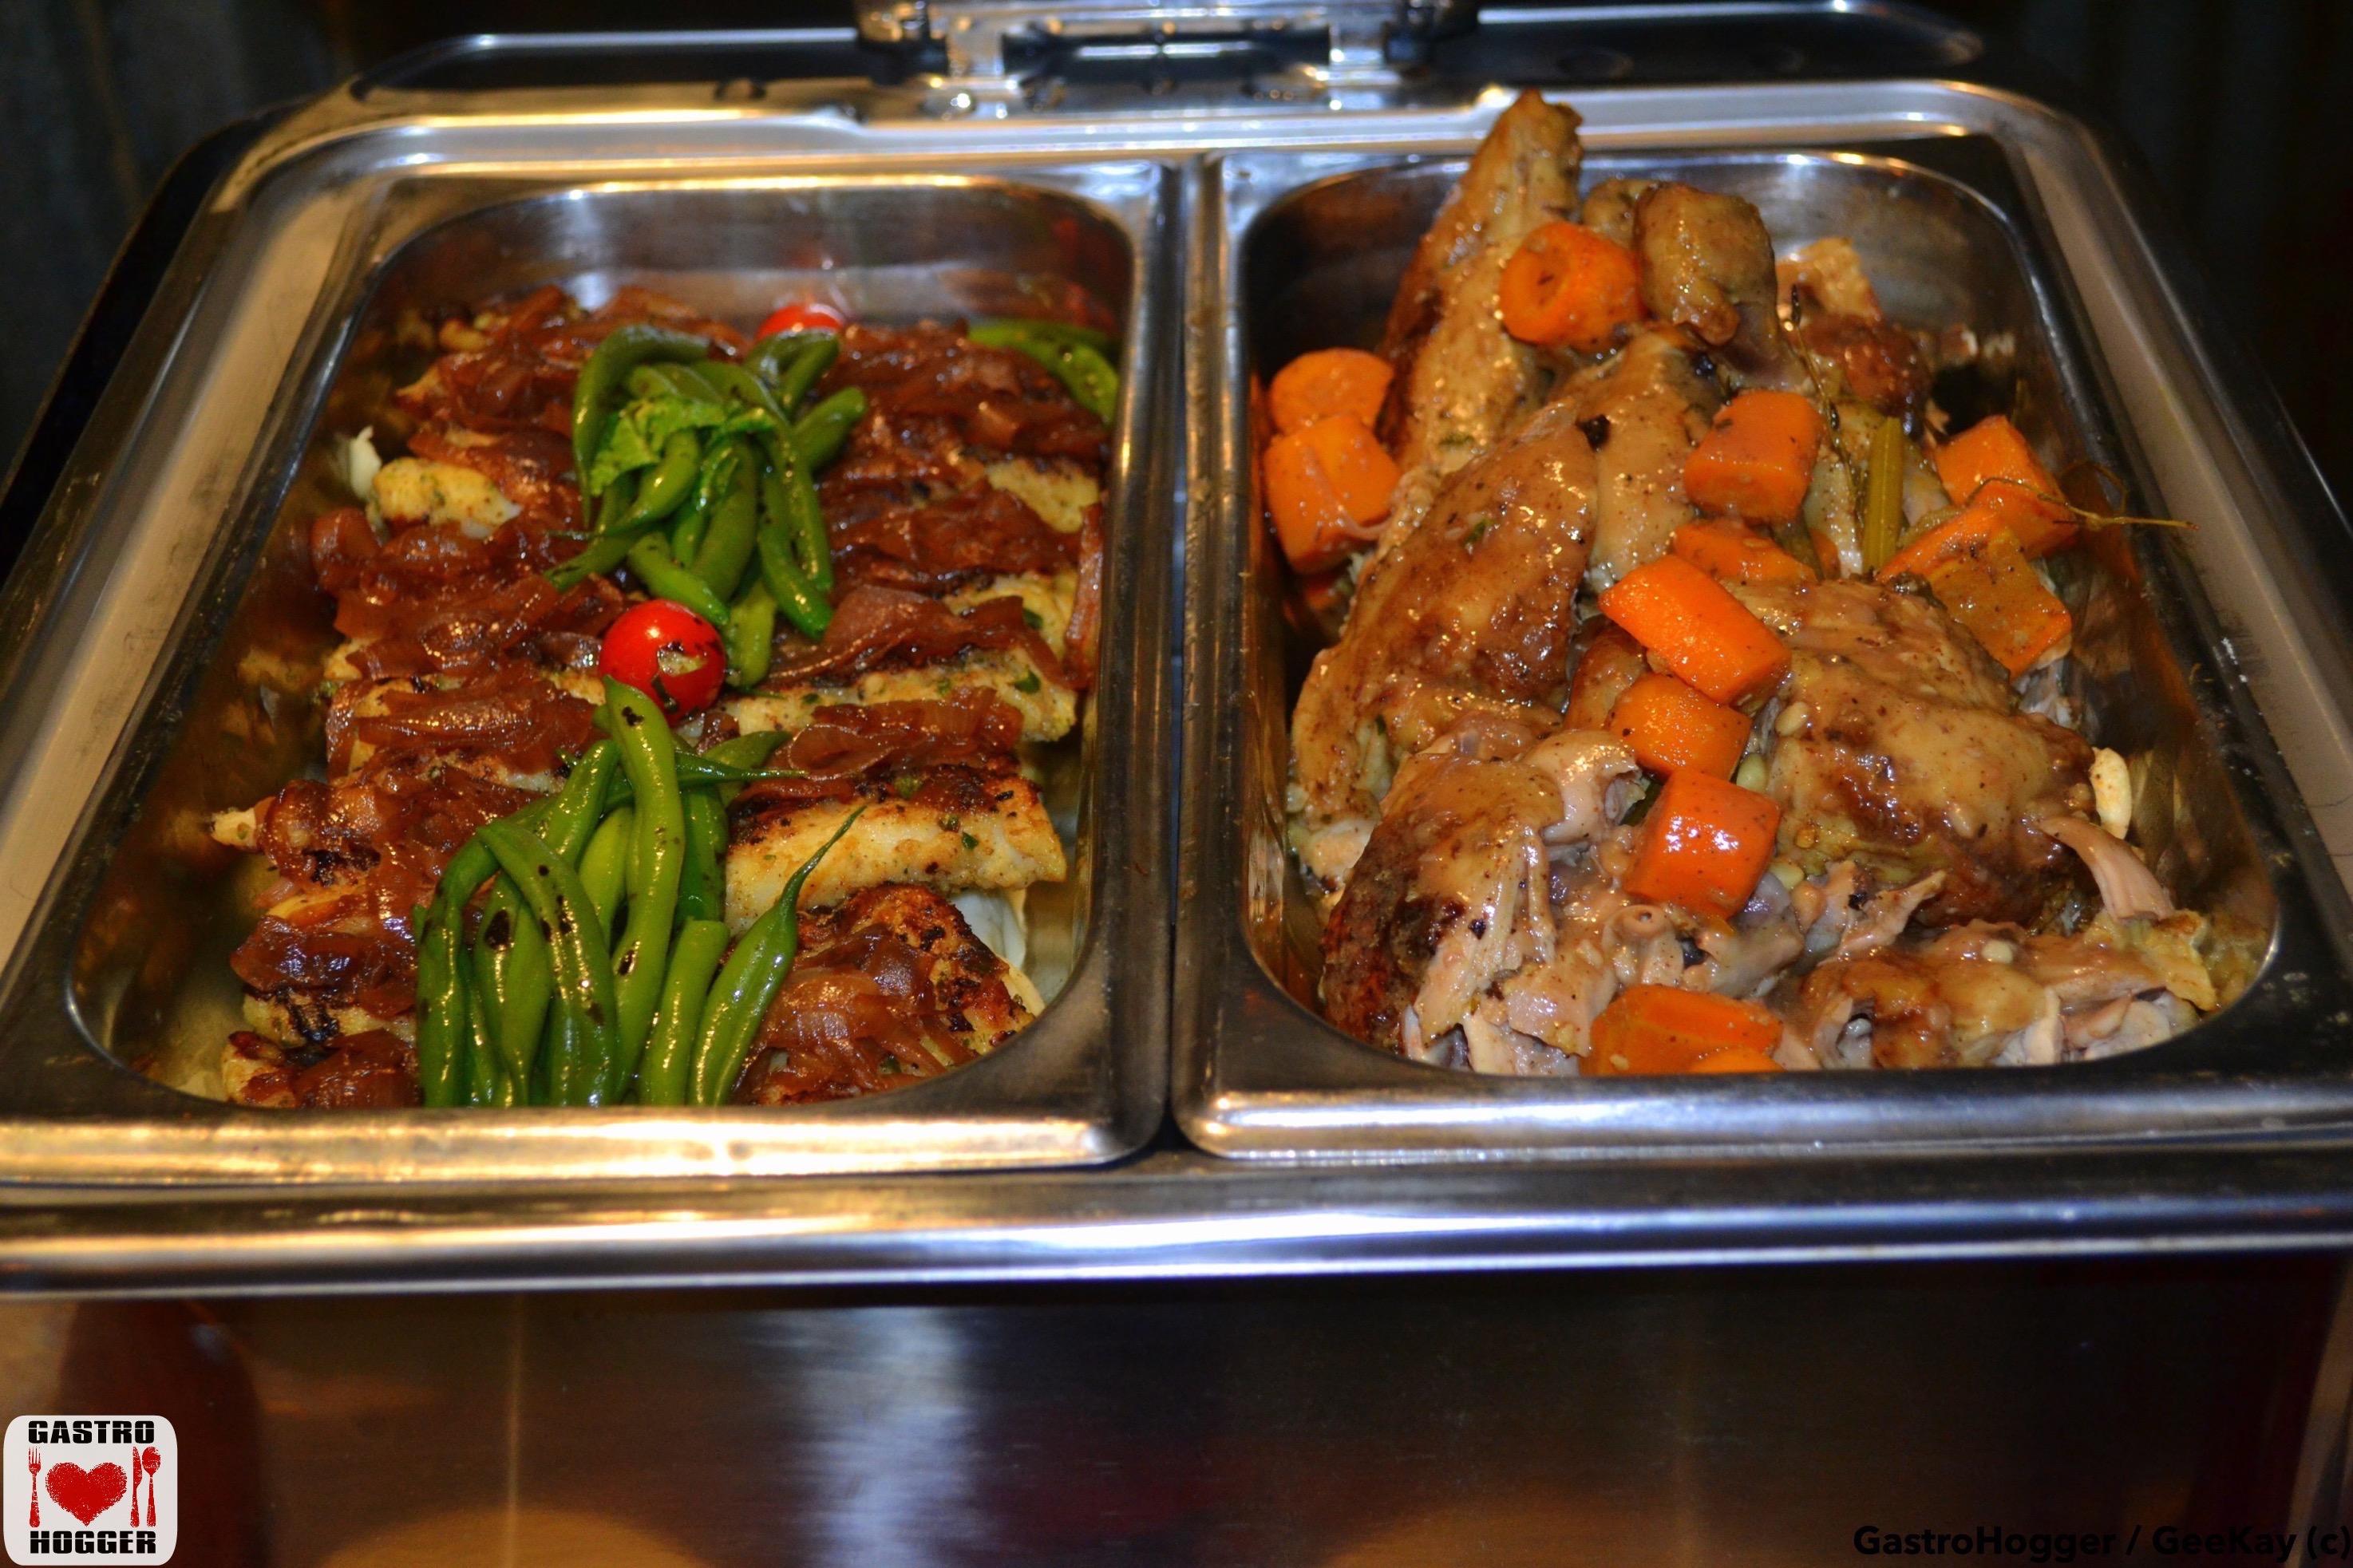 Poched Baha & Roast chicken